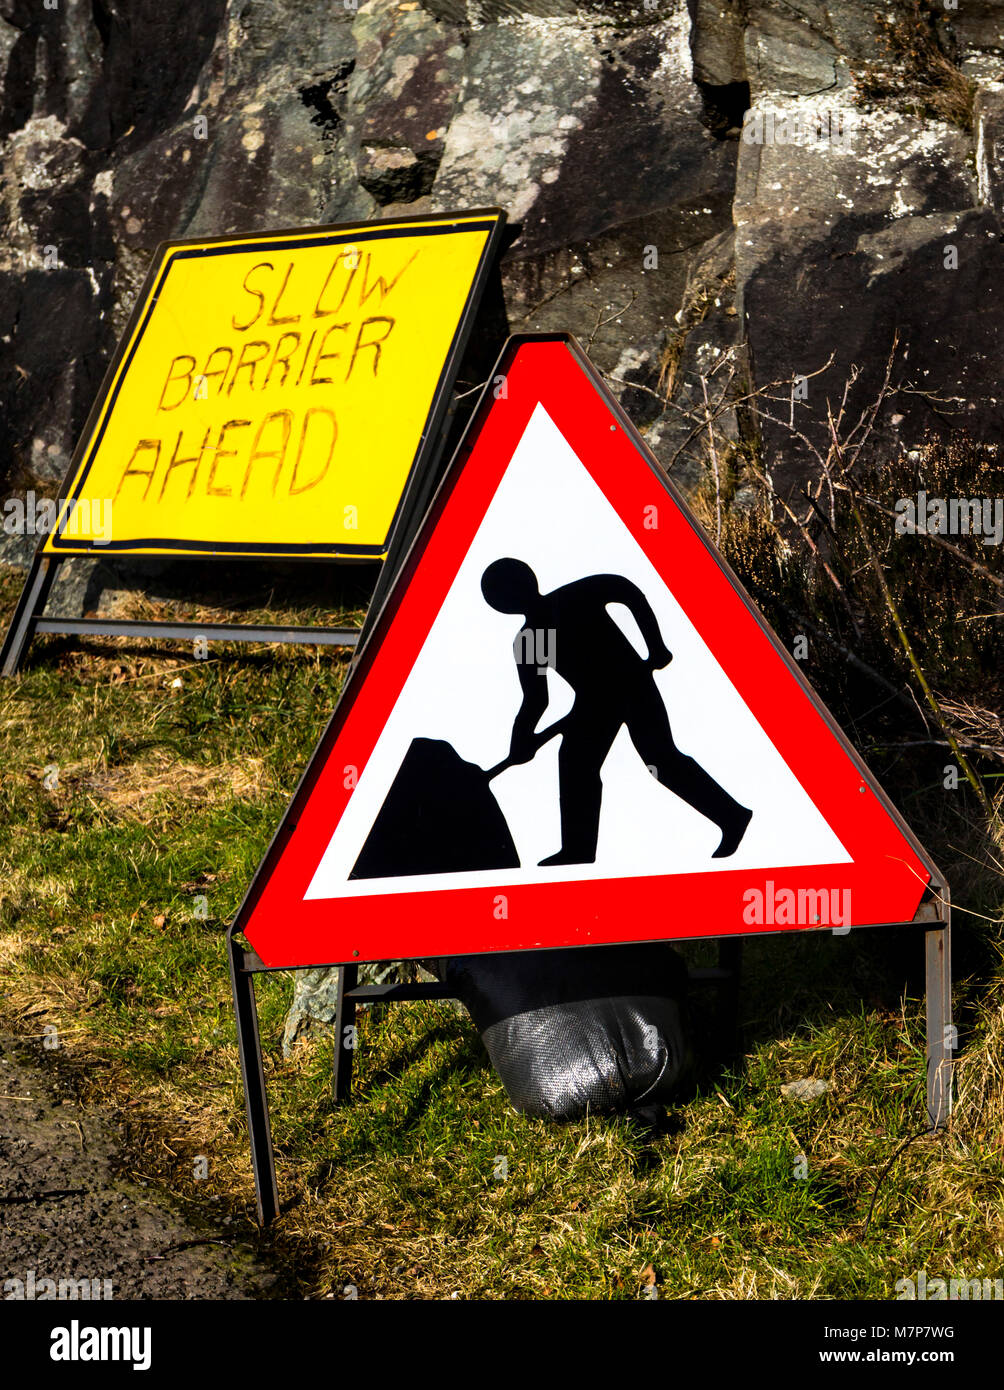 Triangular roadworks ahead warning sign, Scotland. - Stock Image